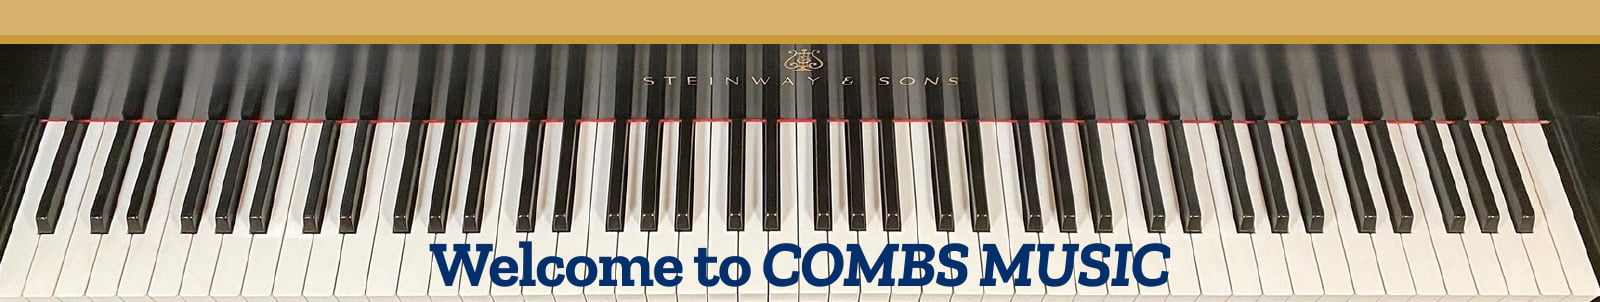 Combs Music